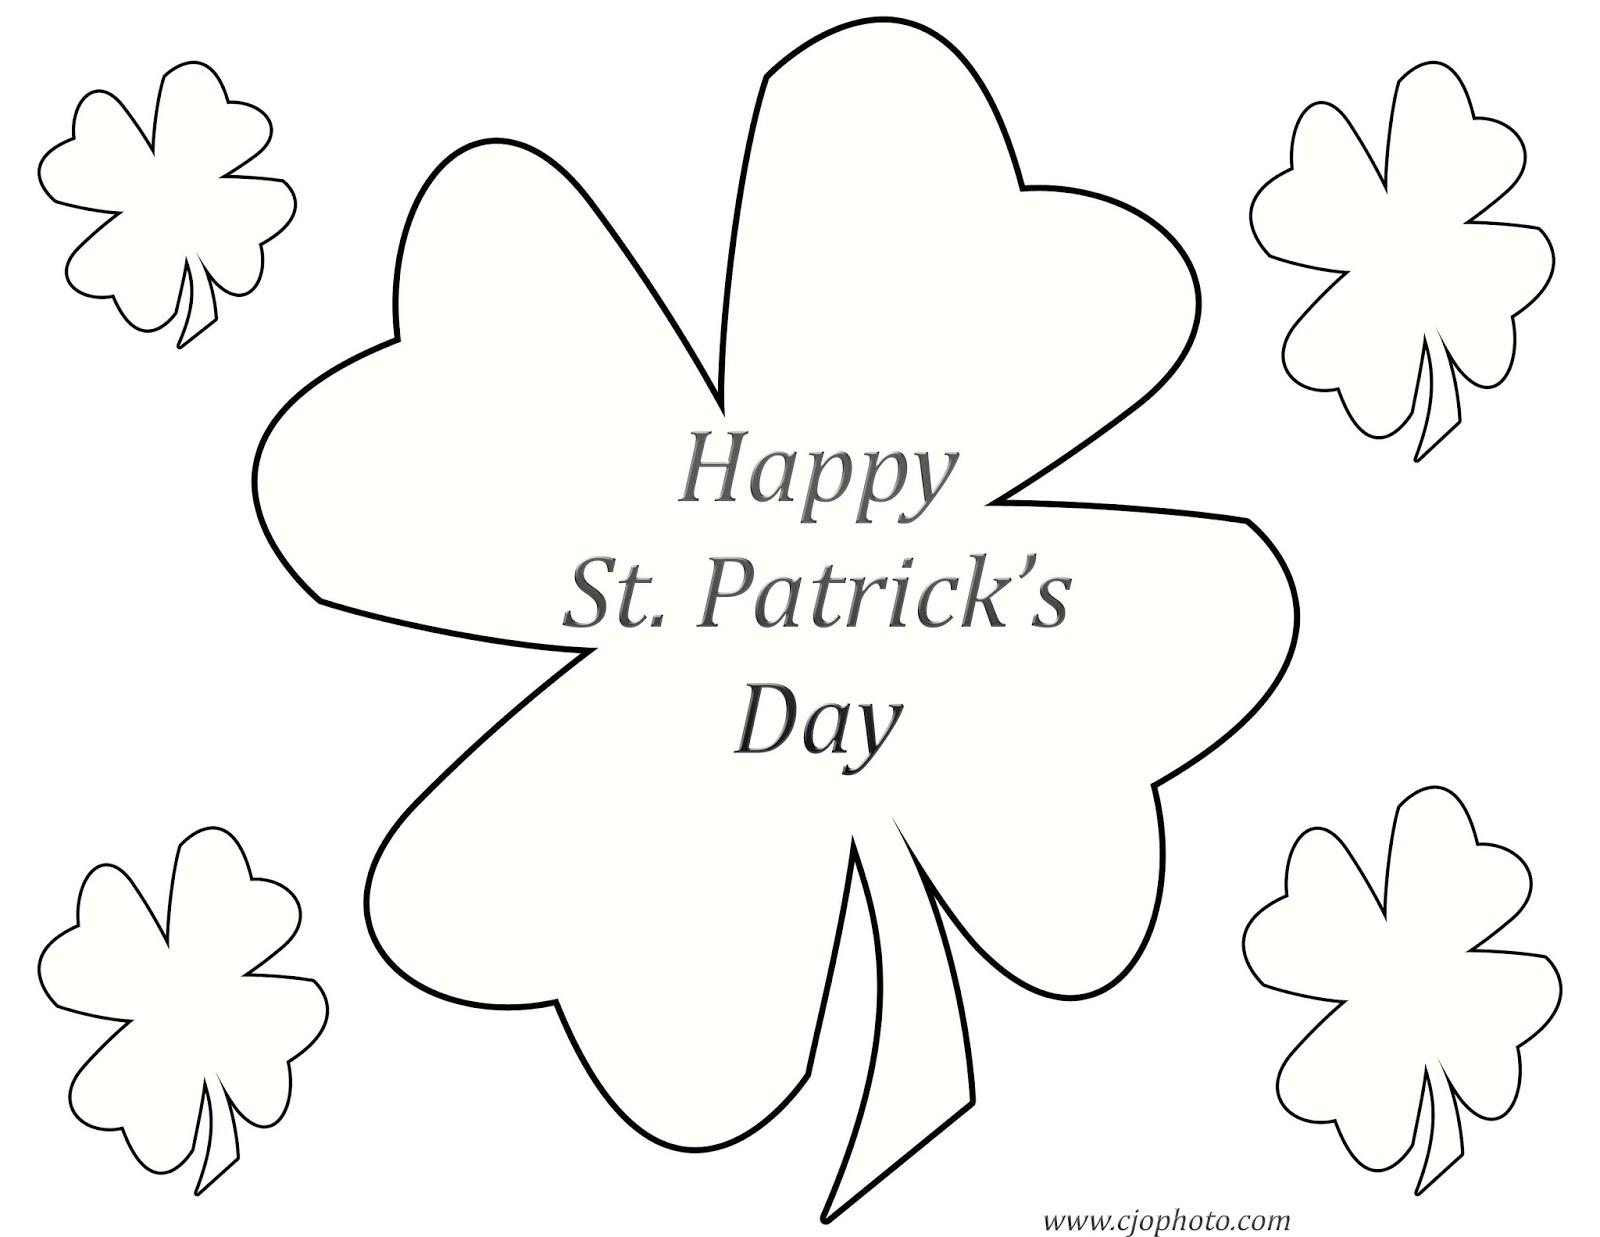 CJO Photo St. Patrick's Day Coloring Page Shamrocks